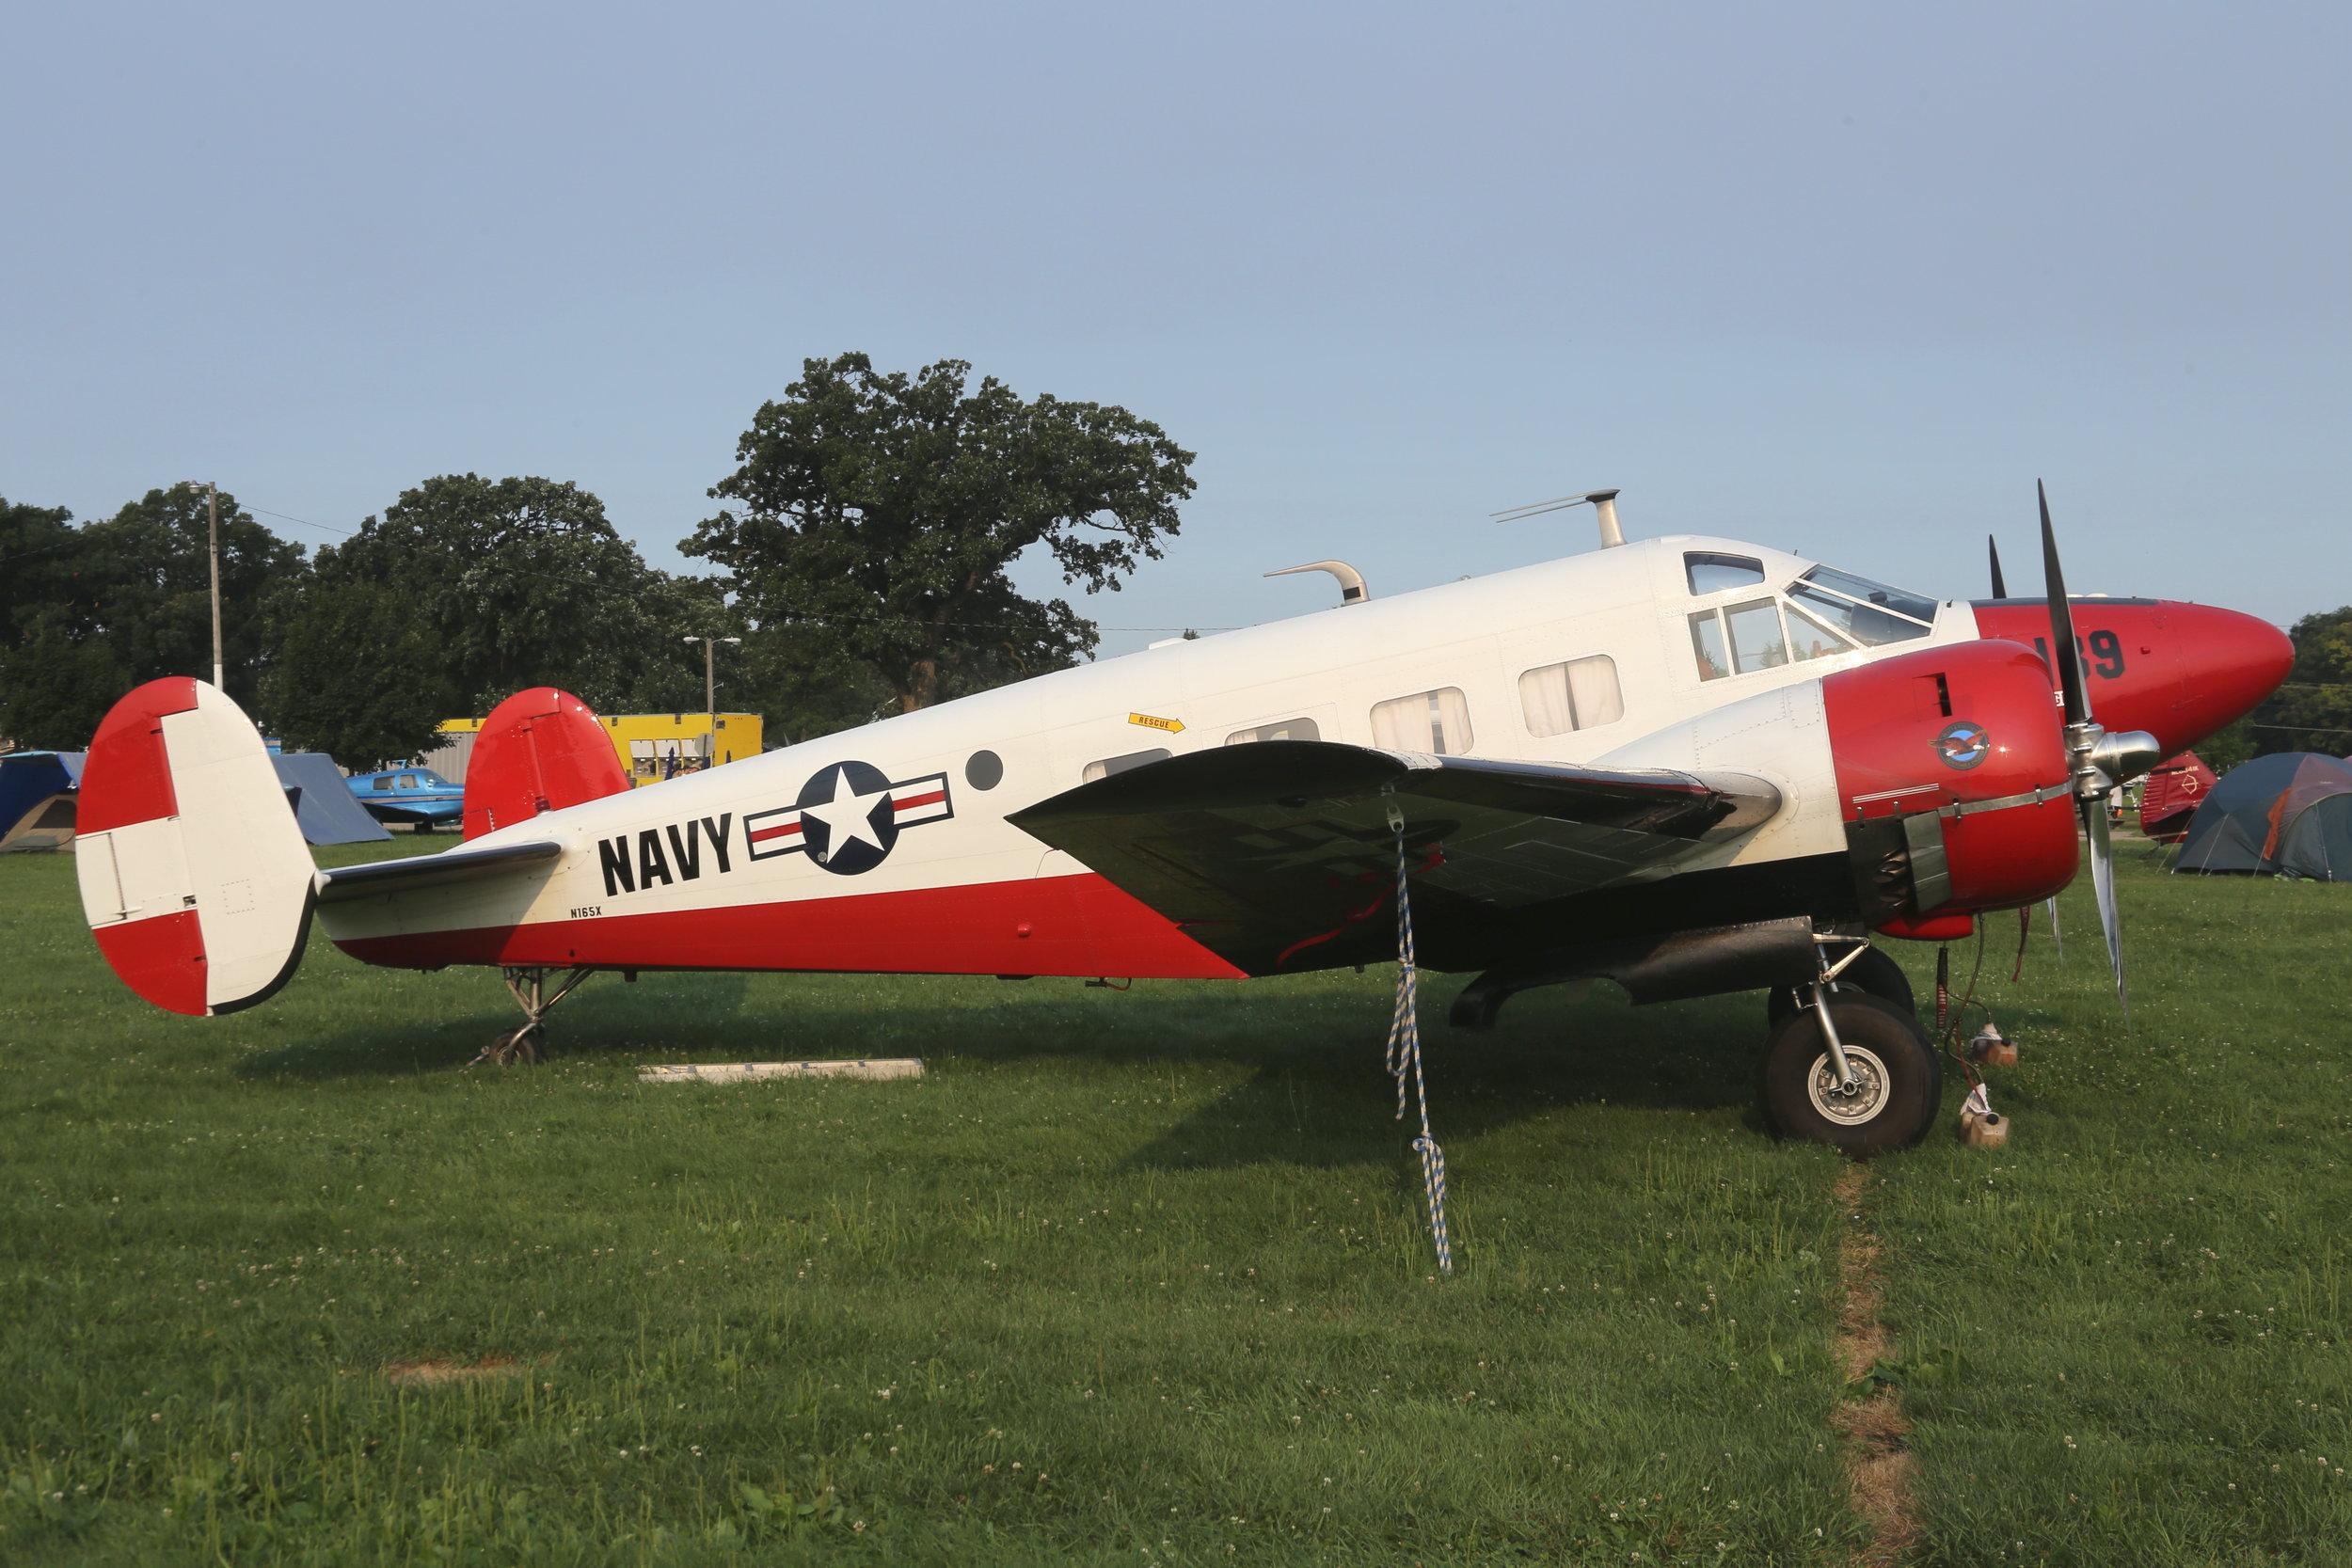 N165X Beech E18S taken at Oshkosh 23rd July 2018 by John Wood